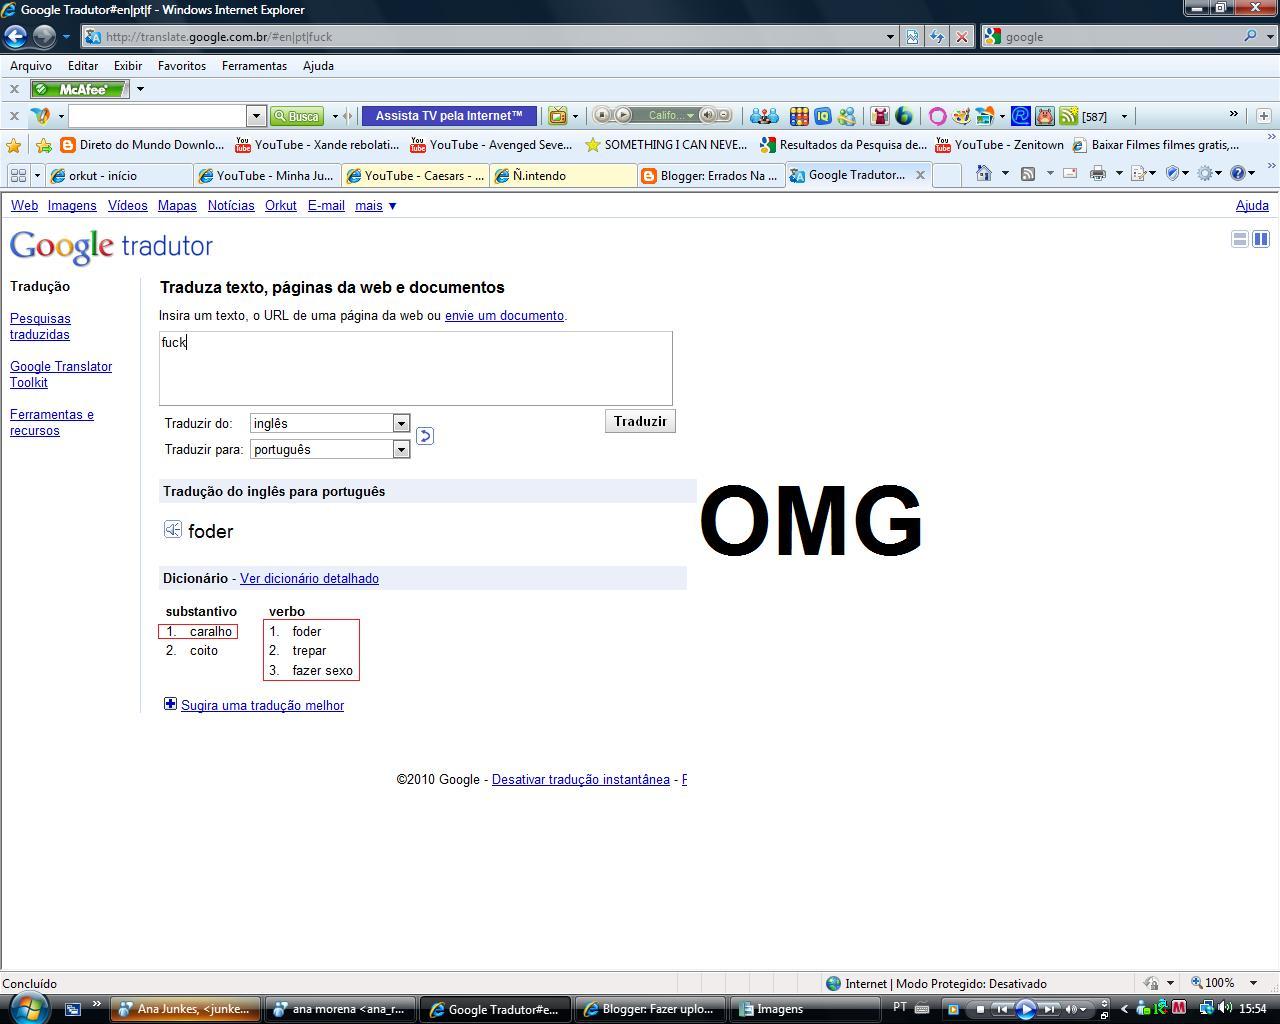 Errados Na Net: Coisas Que So Se Ver No Google Tradutor - photo#47